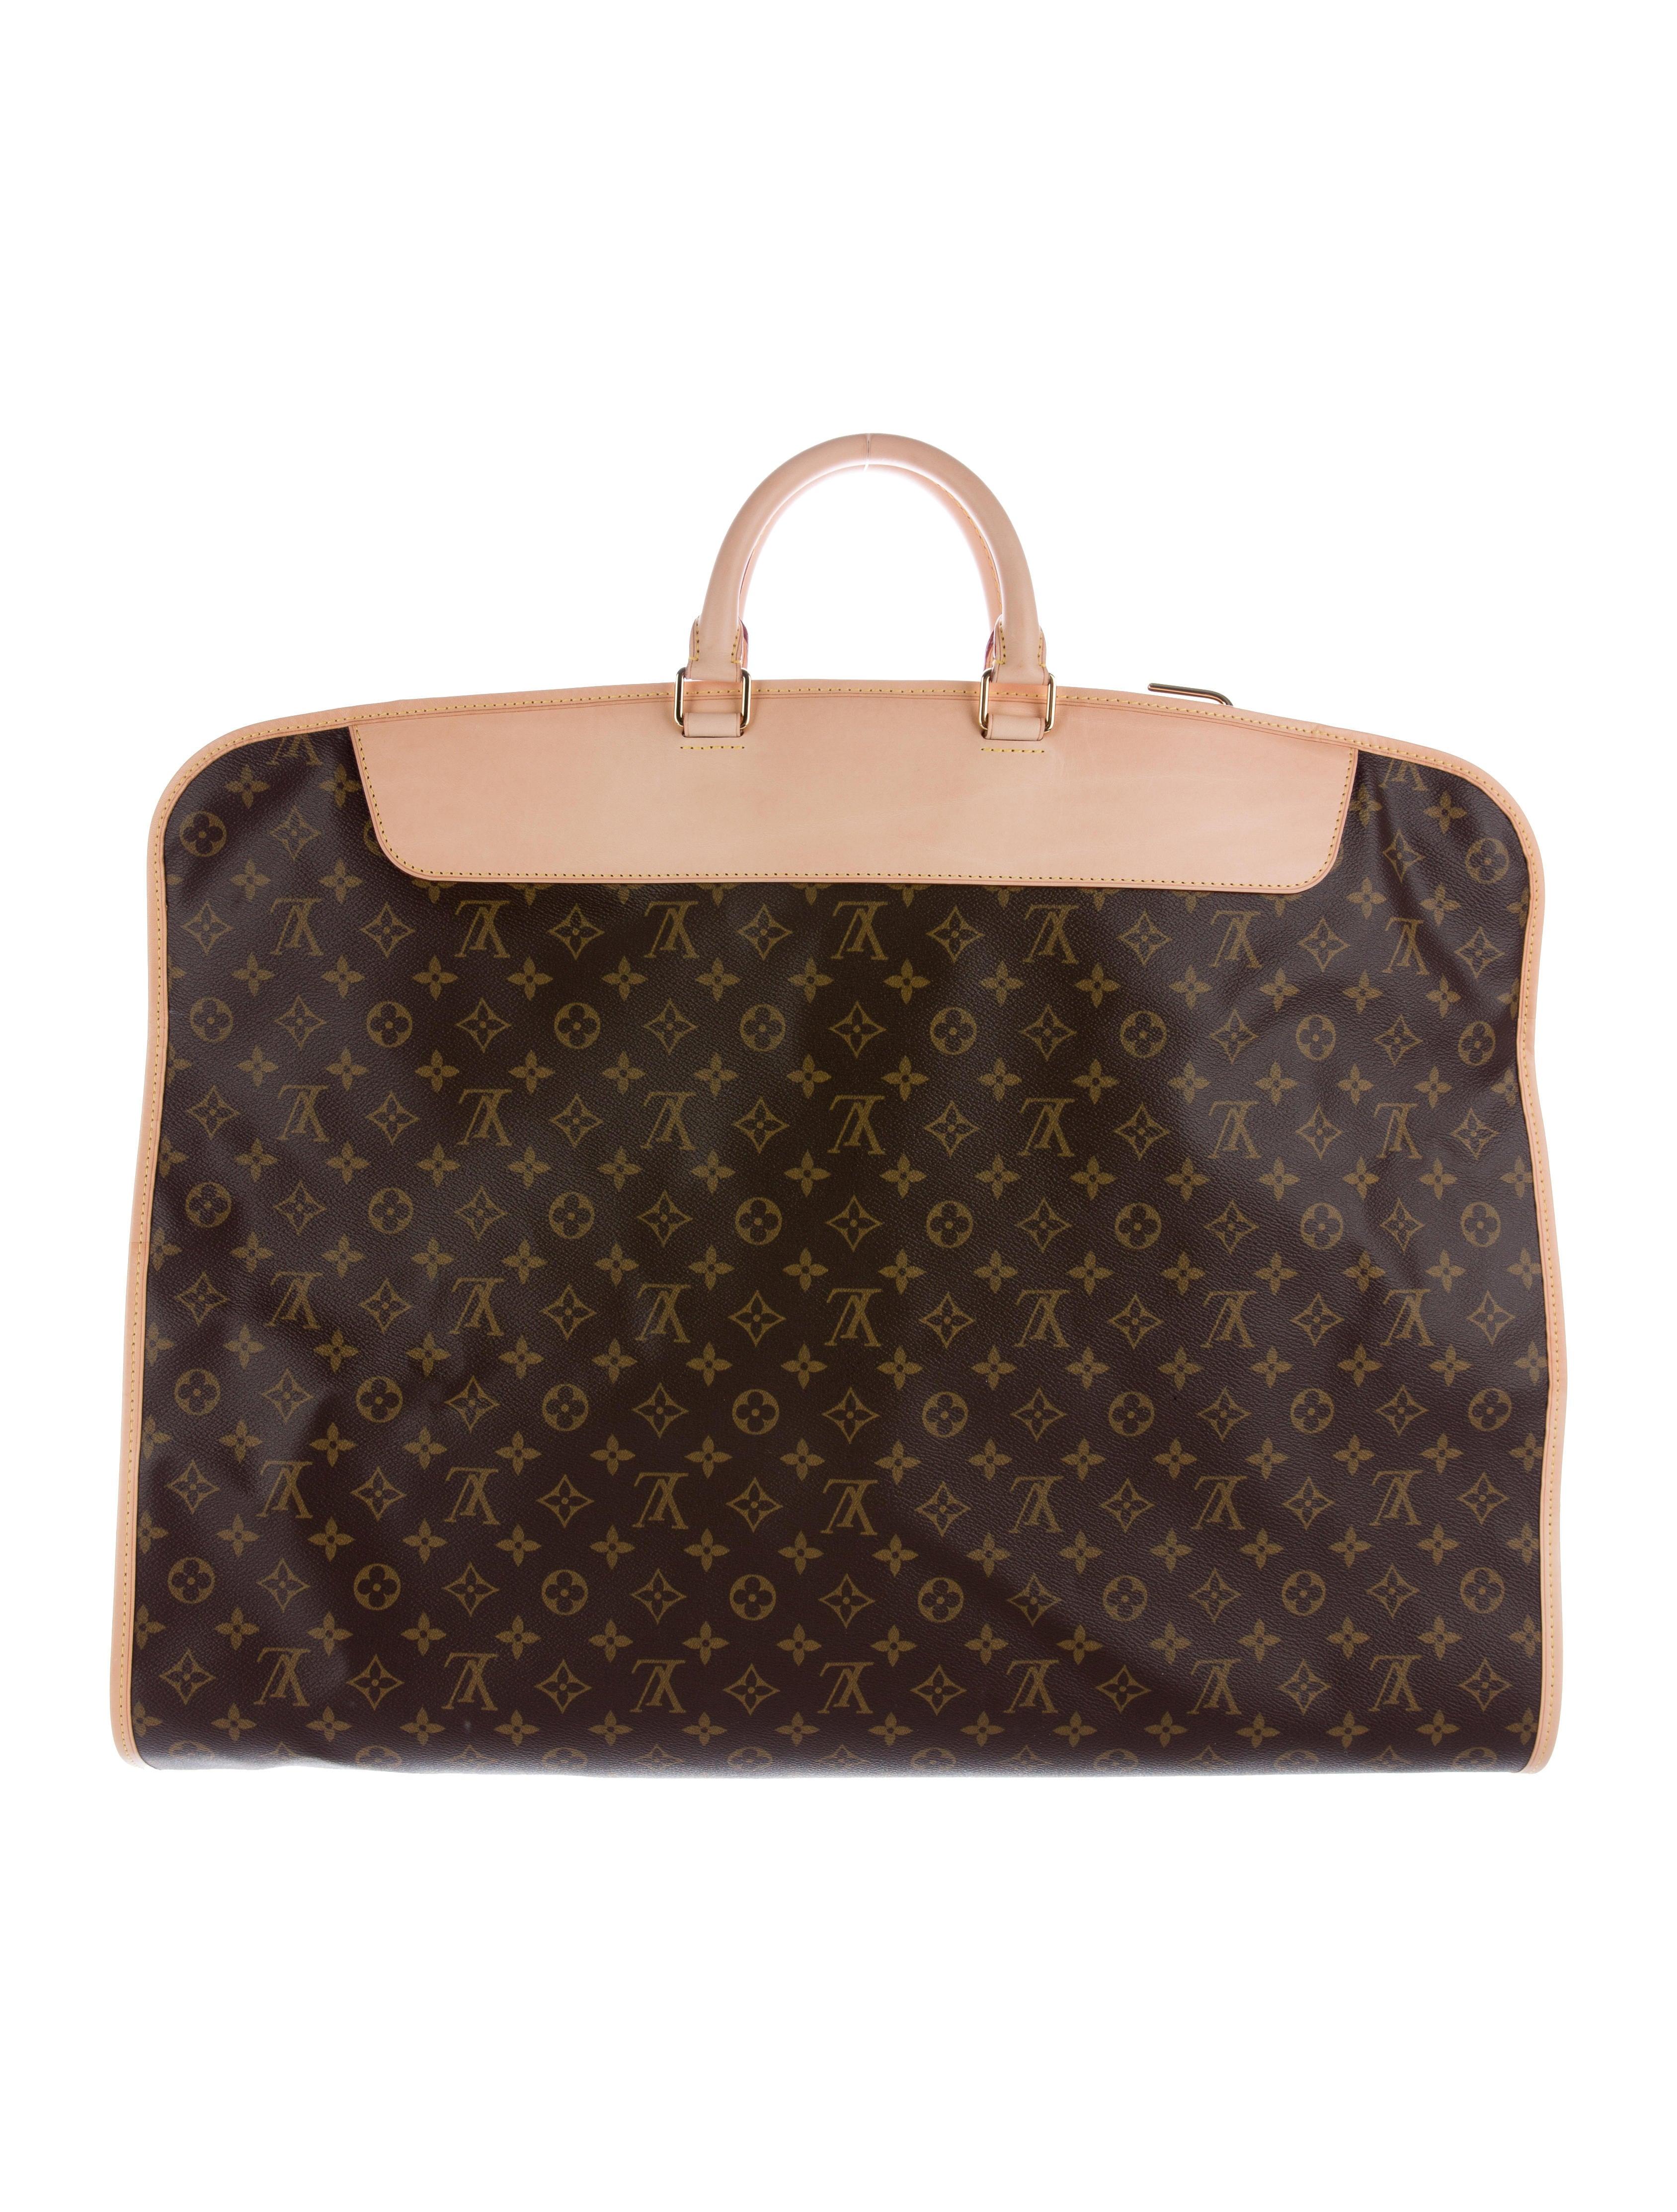 Louis Vuitton Monogram Garment Cover W 2 Hangers Bags